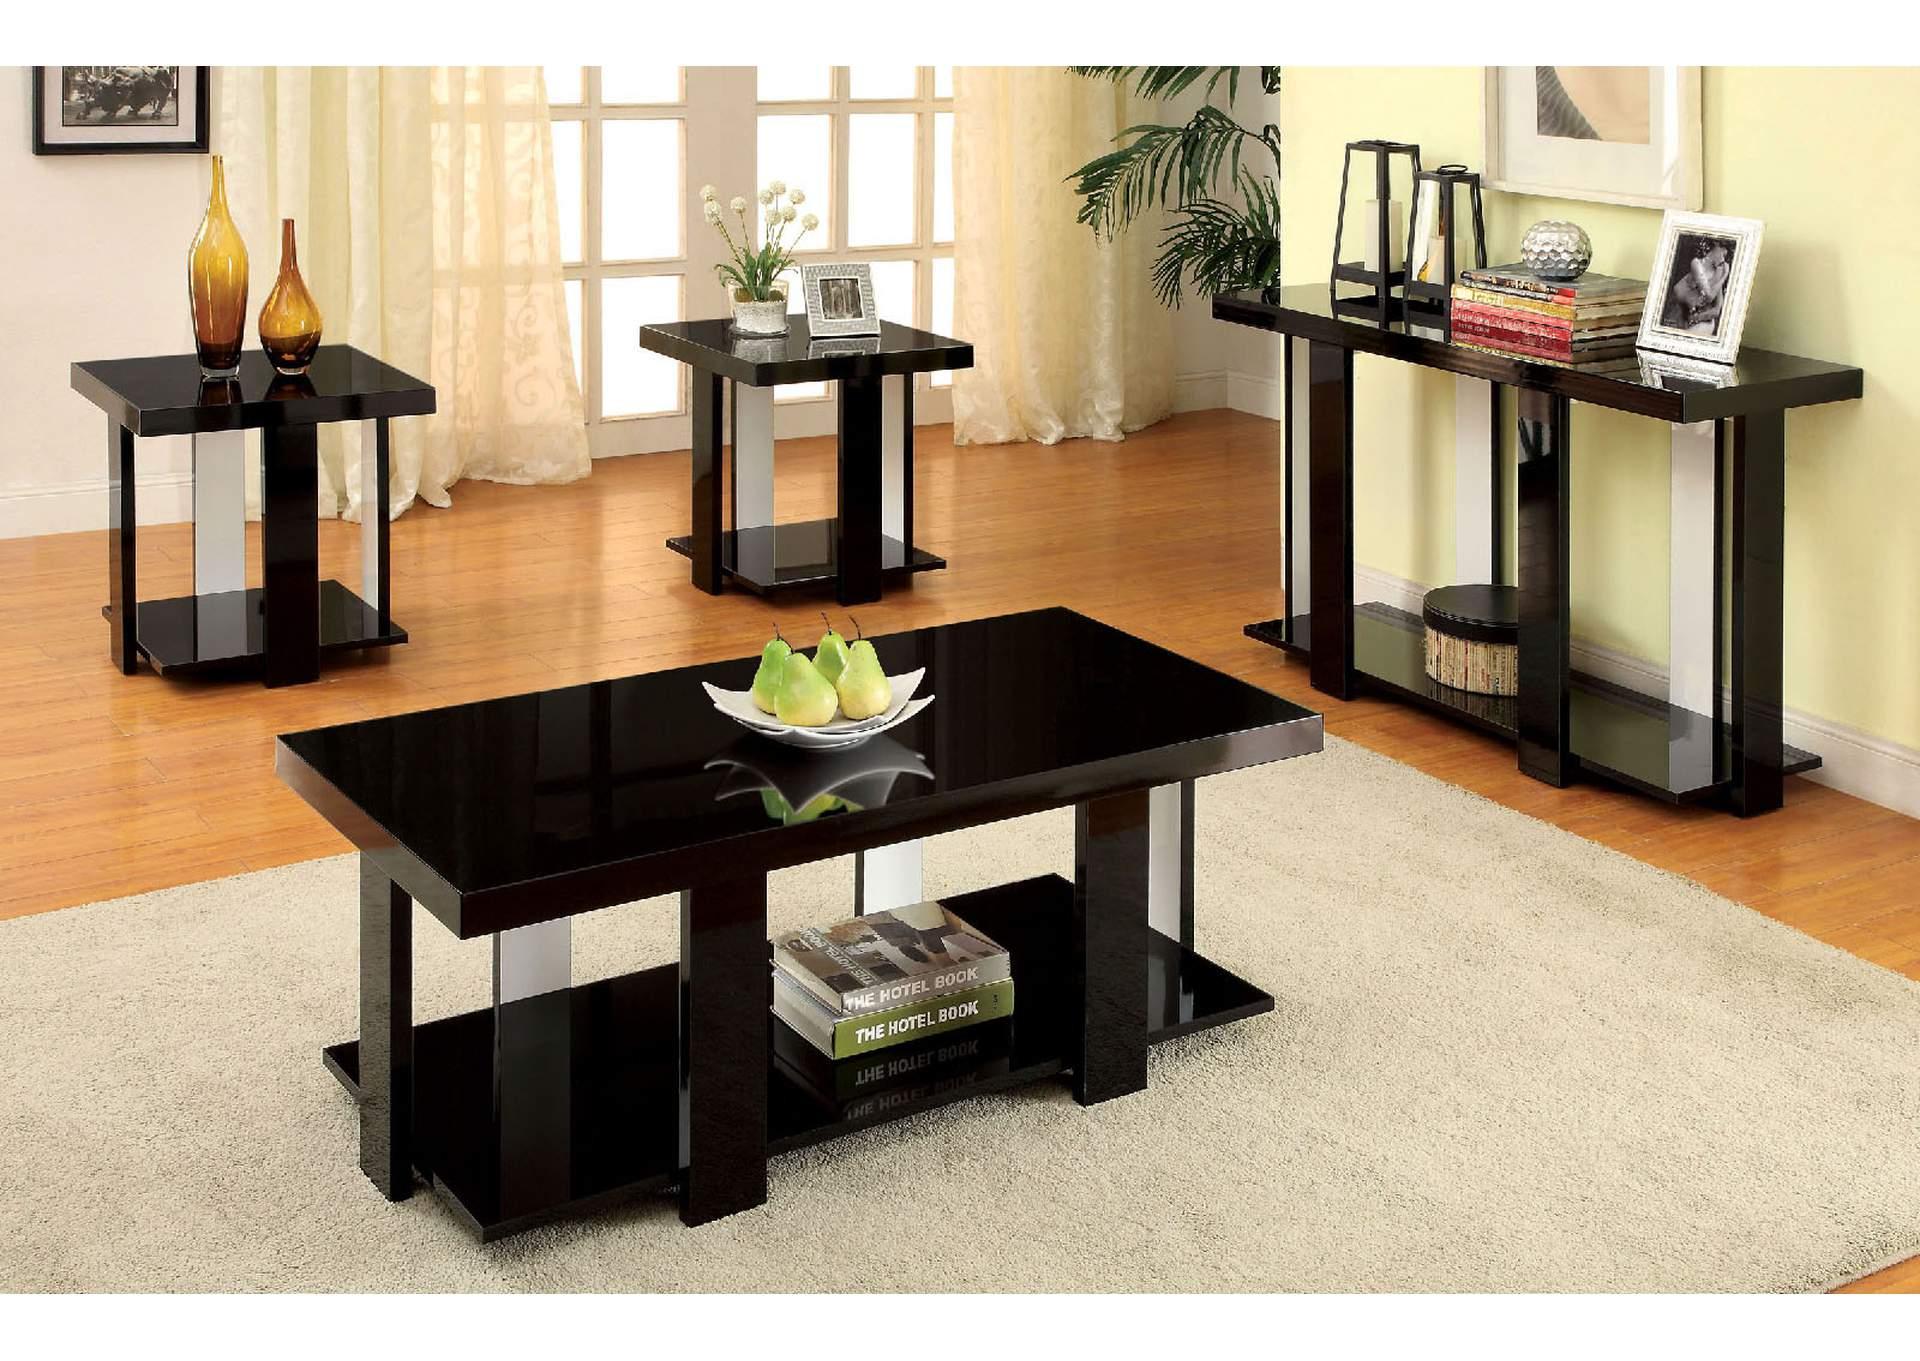 Lakoti l 3 Piece Black Lacquer Table Set w/Open Shelf (Coffee \u0026 2 & Hollywood Mattress and Furniture Lakoti l 3 Piece Black Lacquer ...